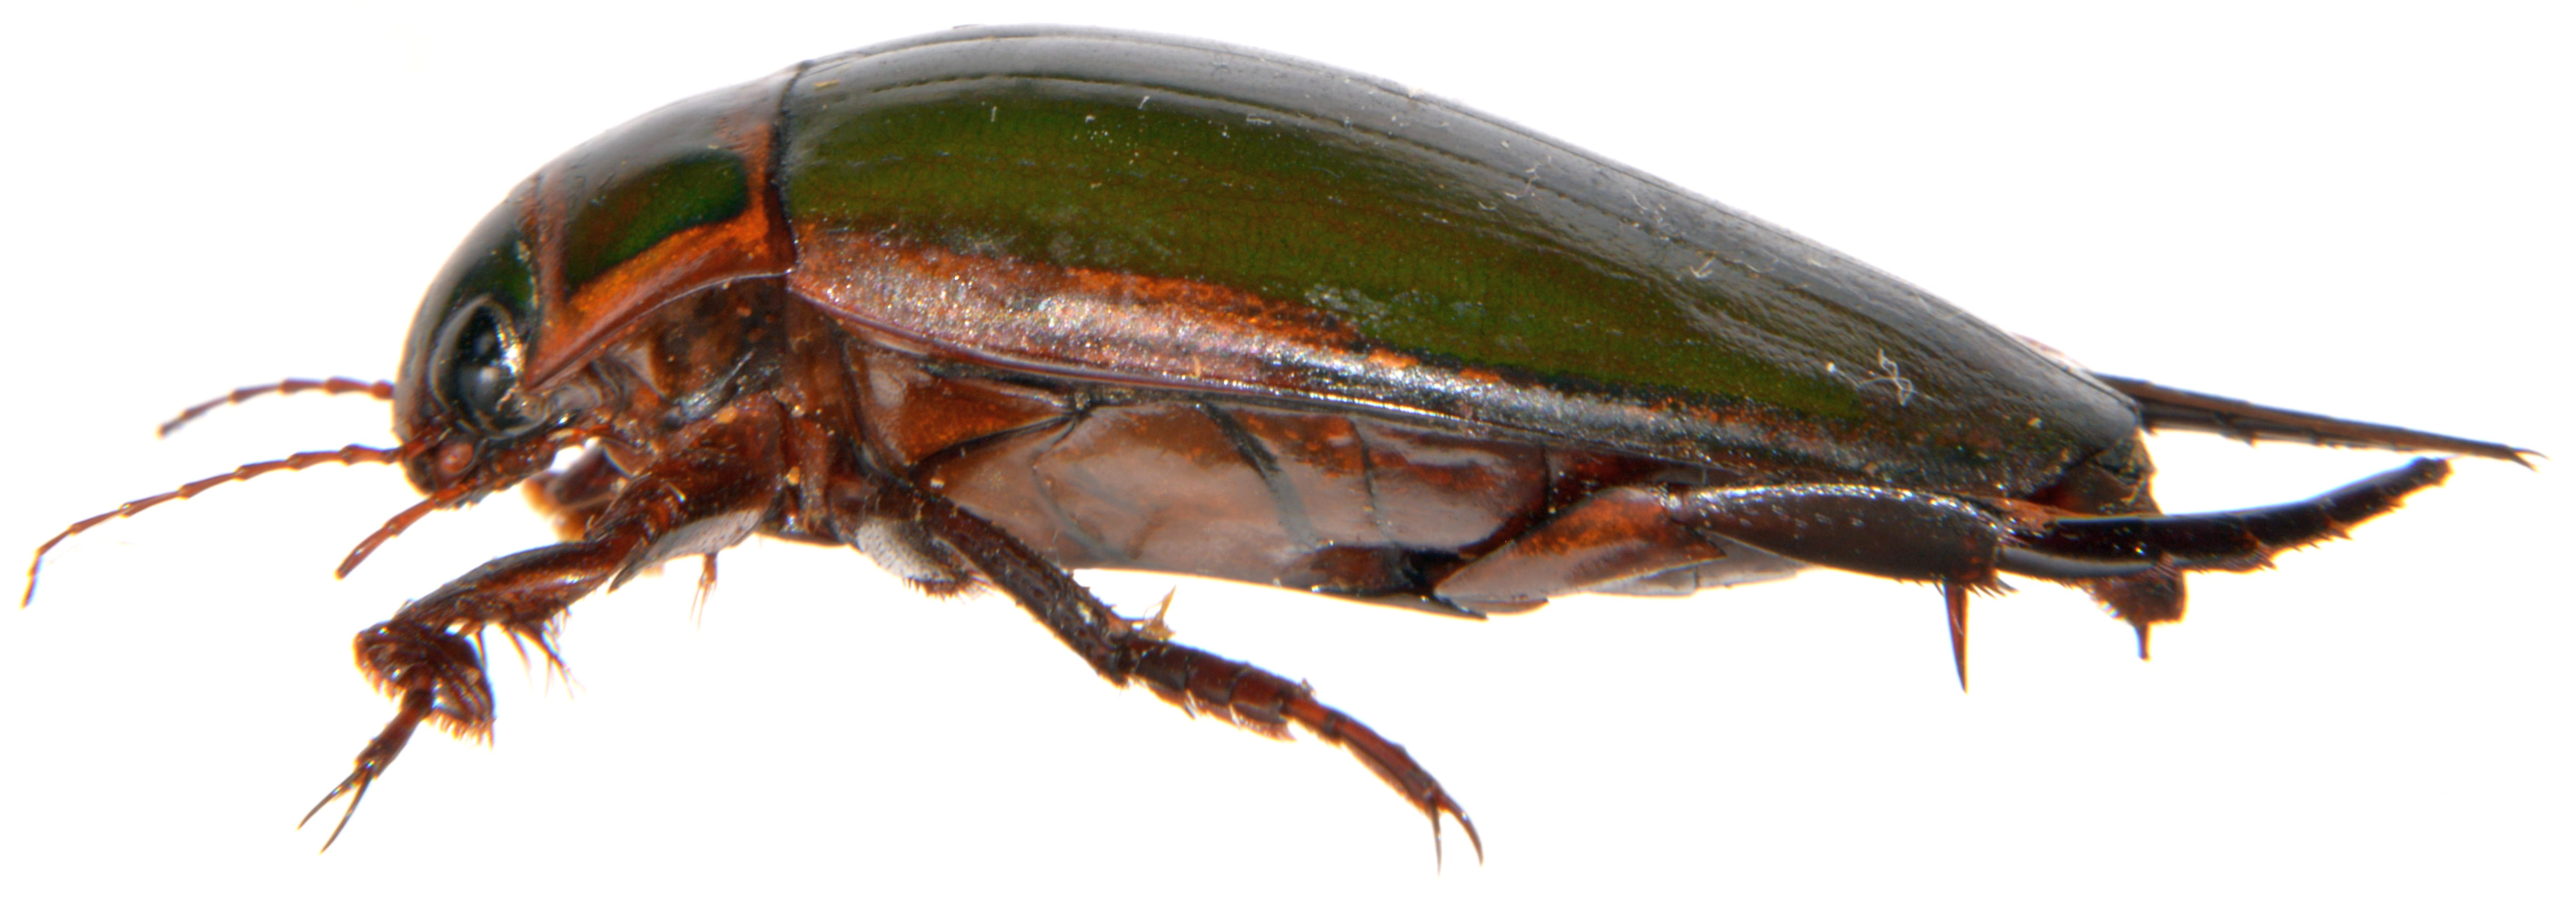 Dytiscus marginalis side view